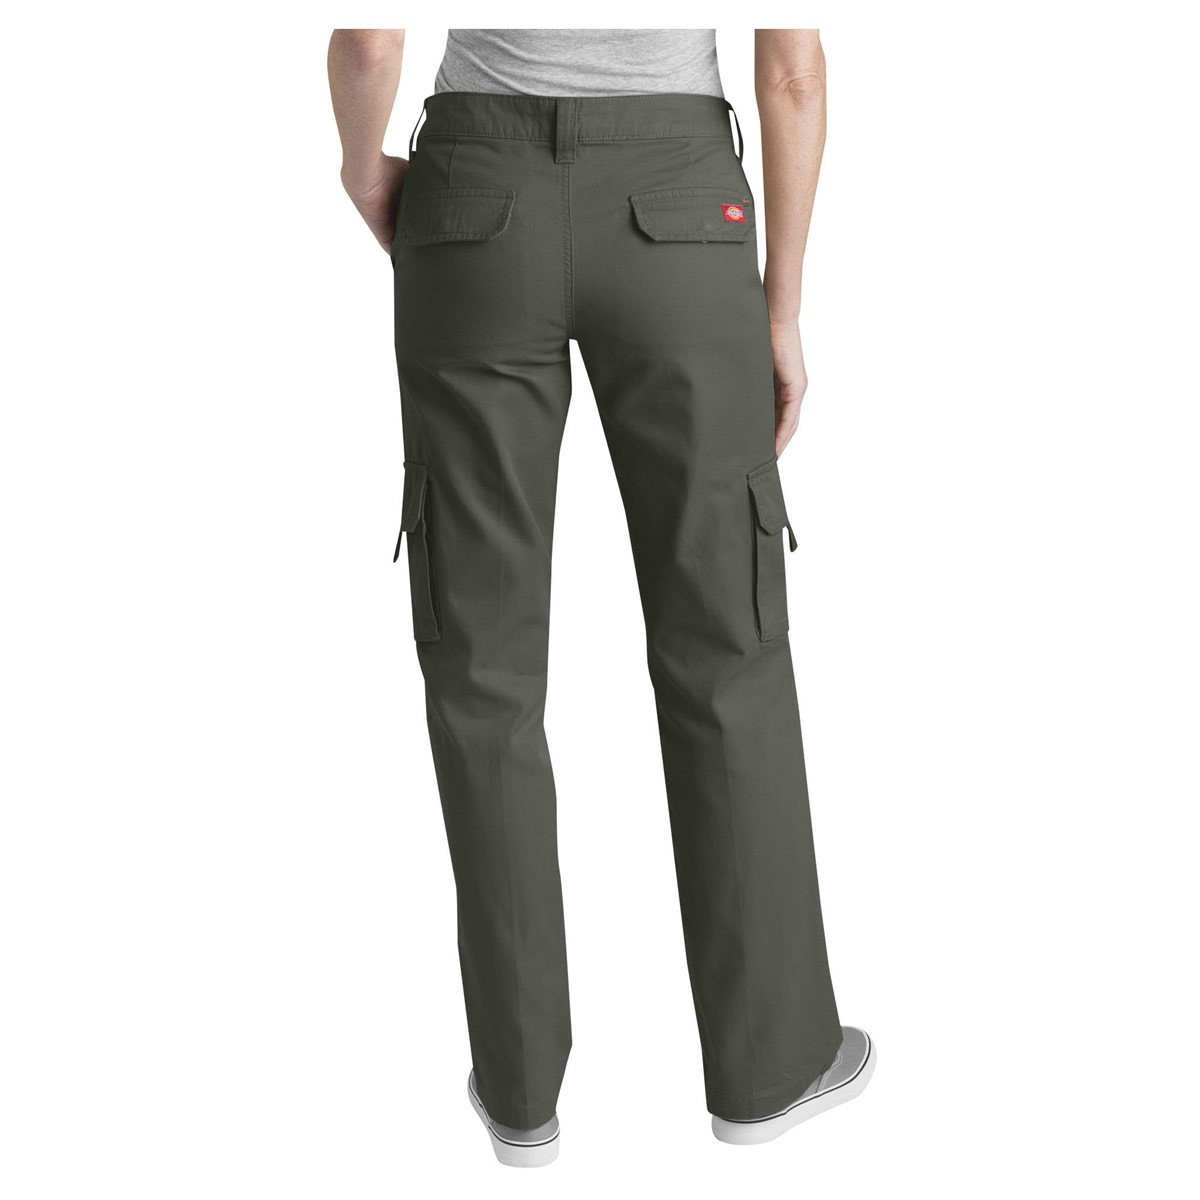 Get designer womens cargo pants